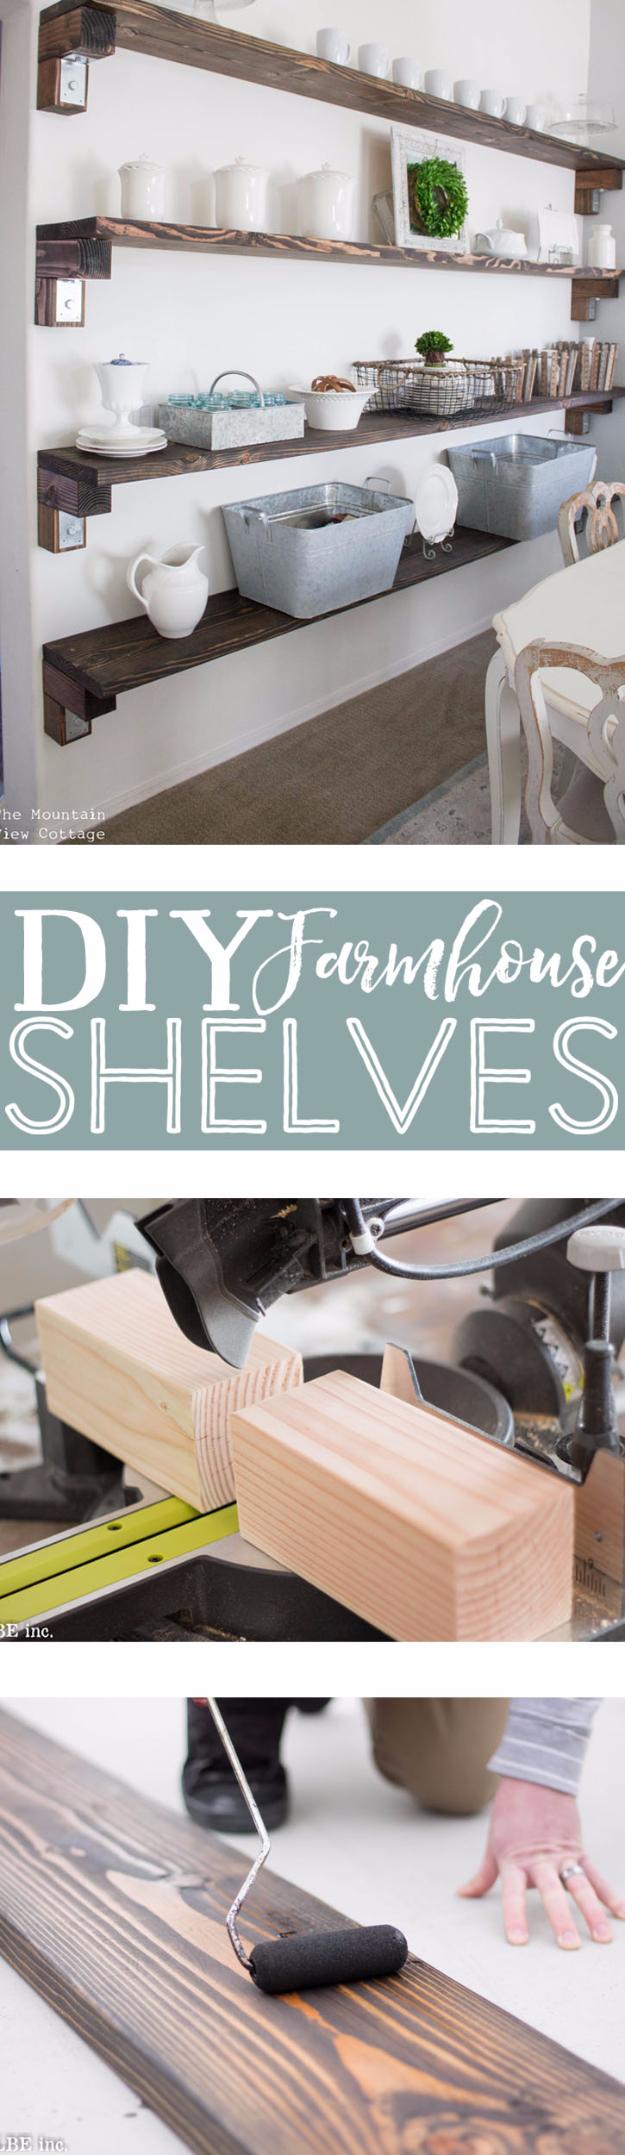 DIY Farmhouse Style Decor Ideas - DIY Farmhouse Shelves - Rustic Ideas for Furniture, Paint Colors, Farm House Decoration for Living Room, Kitchen and Bedroom #diy